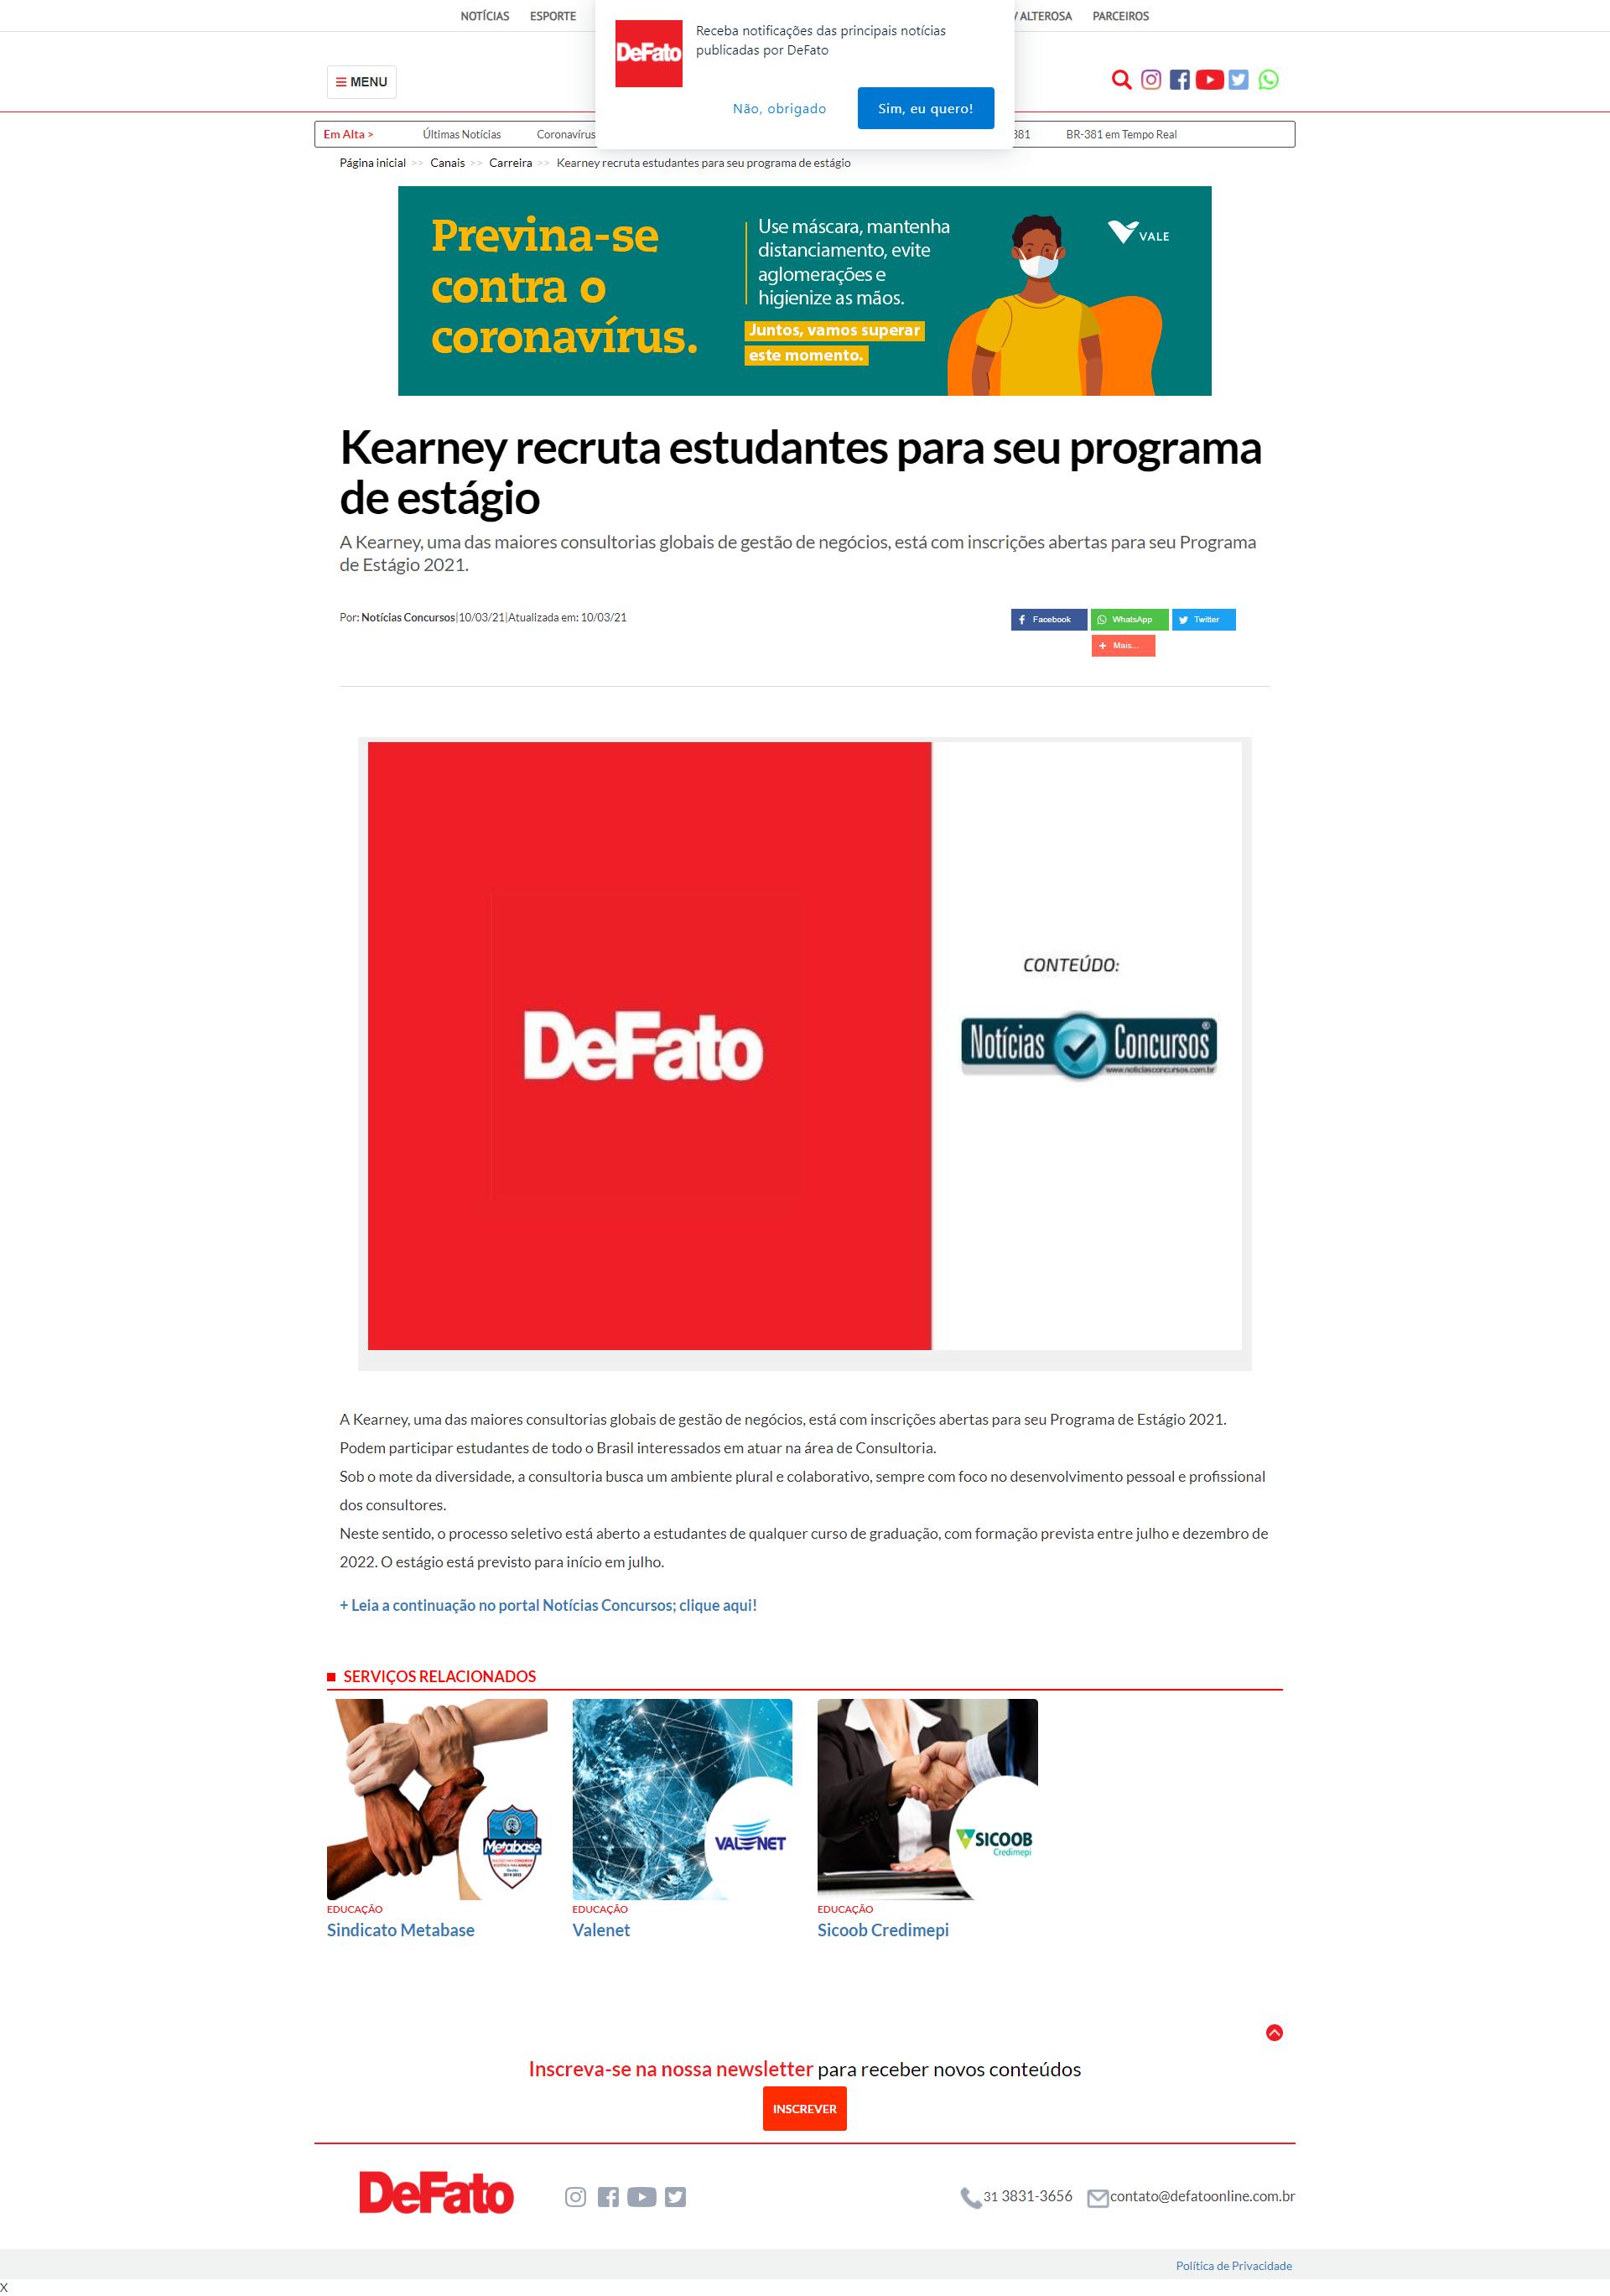 Kearney recruta estudantes para seu programa de estágio - De Fato (On-line)